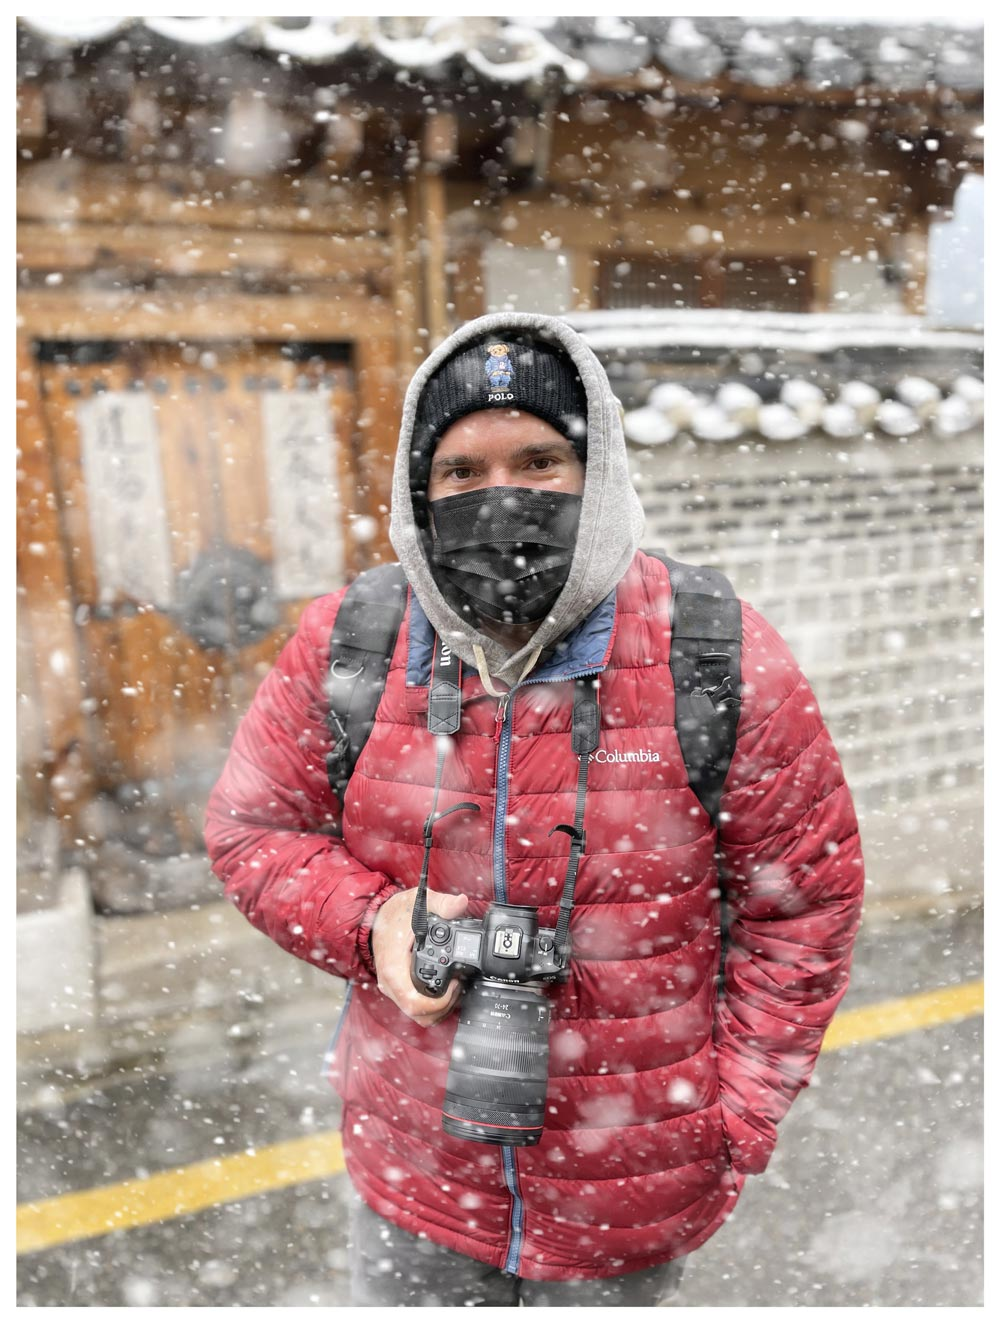 Shea Winter Roggio Taking Photos